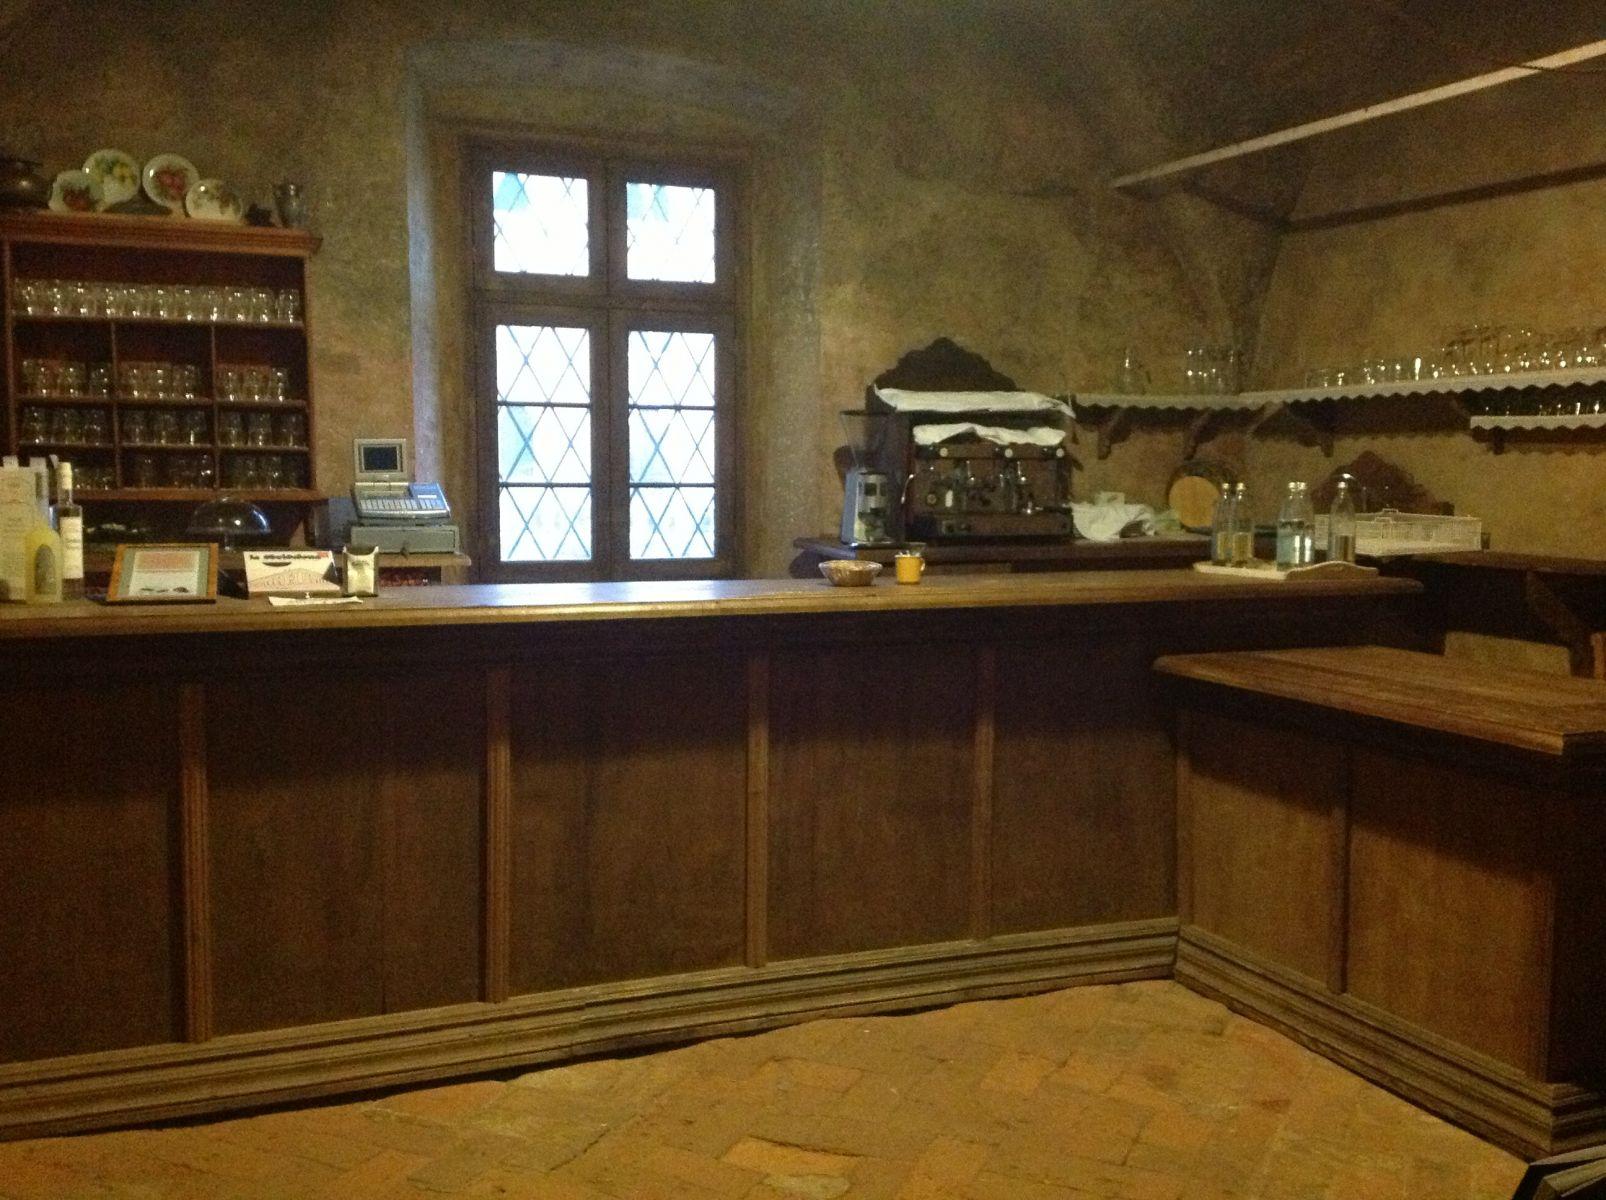 Bancone bar foto29-01-13161456.jpg